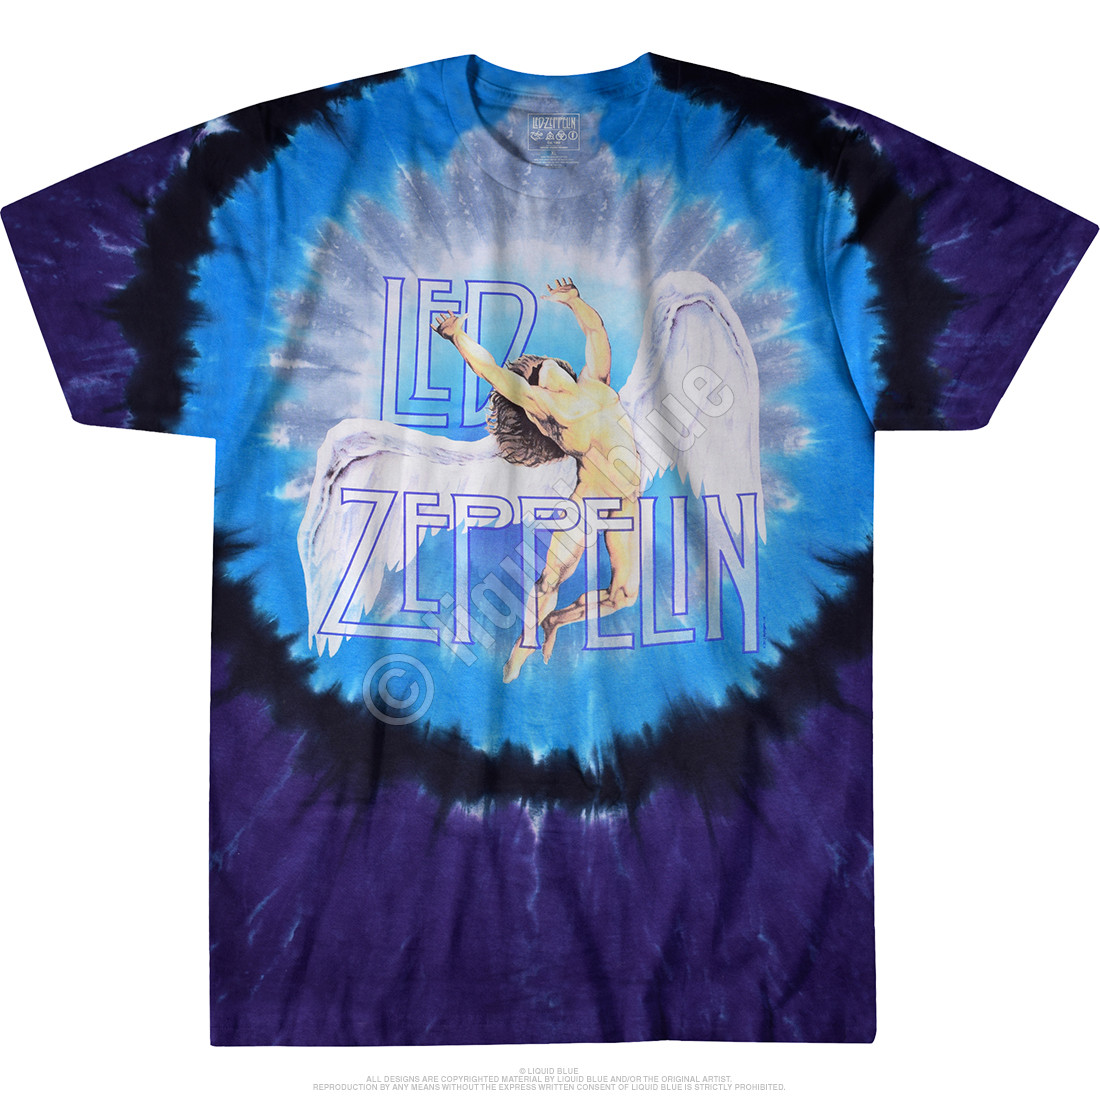 Swan Song Tie-Dye T-Shirt